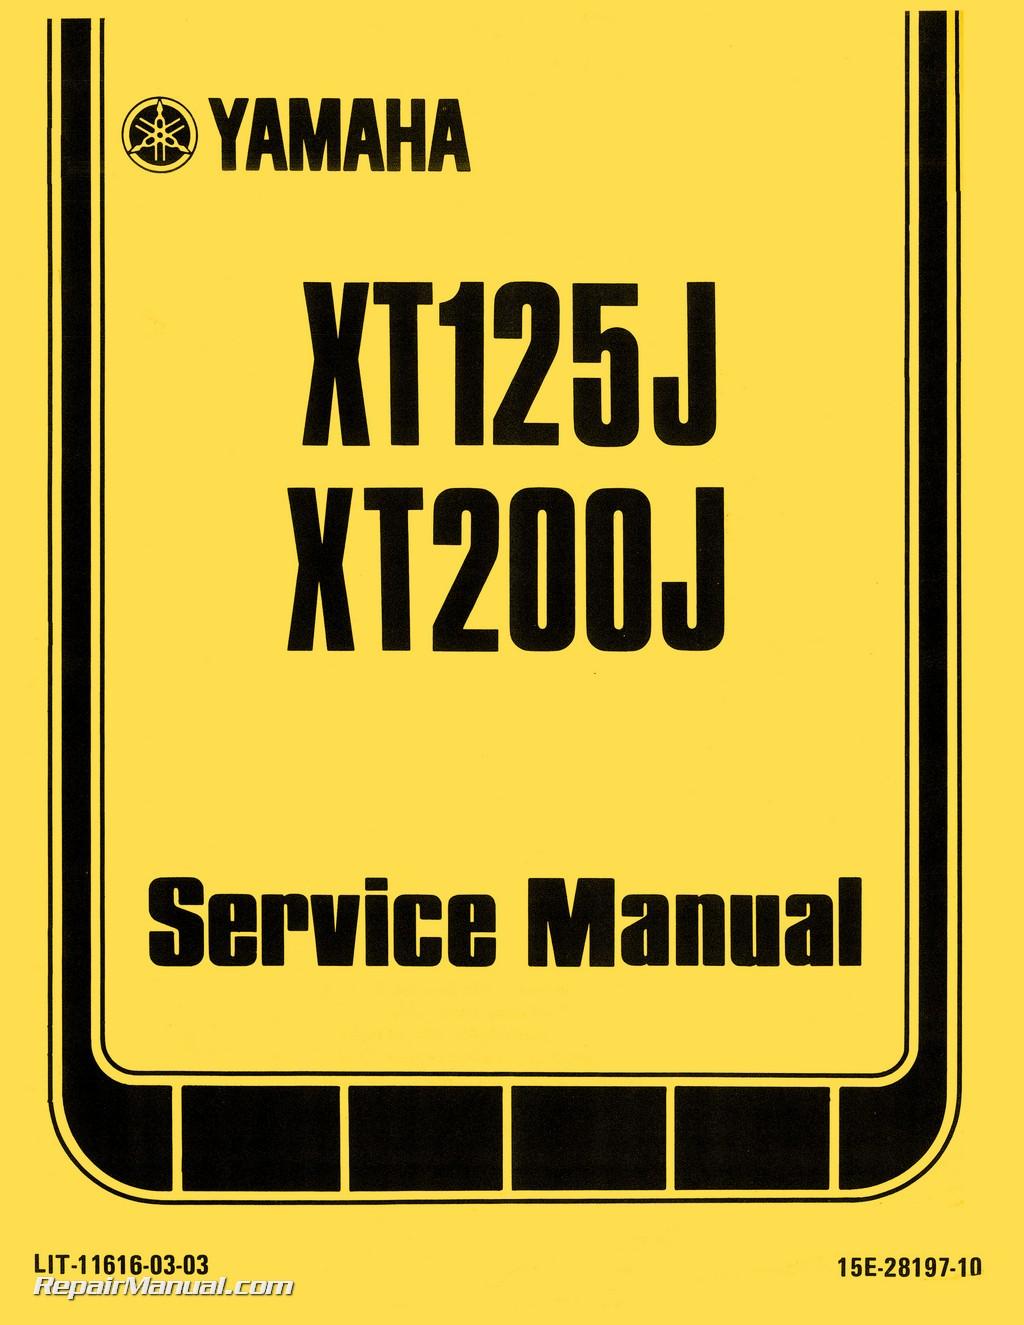 1982-Yamaha-XT125J-XT200J-Motorcycle-Service-Manual_Page_01.jpg ...